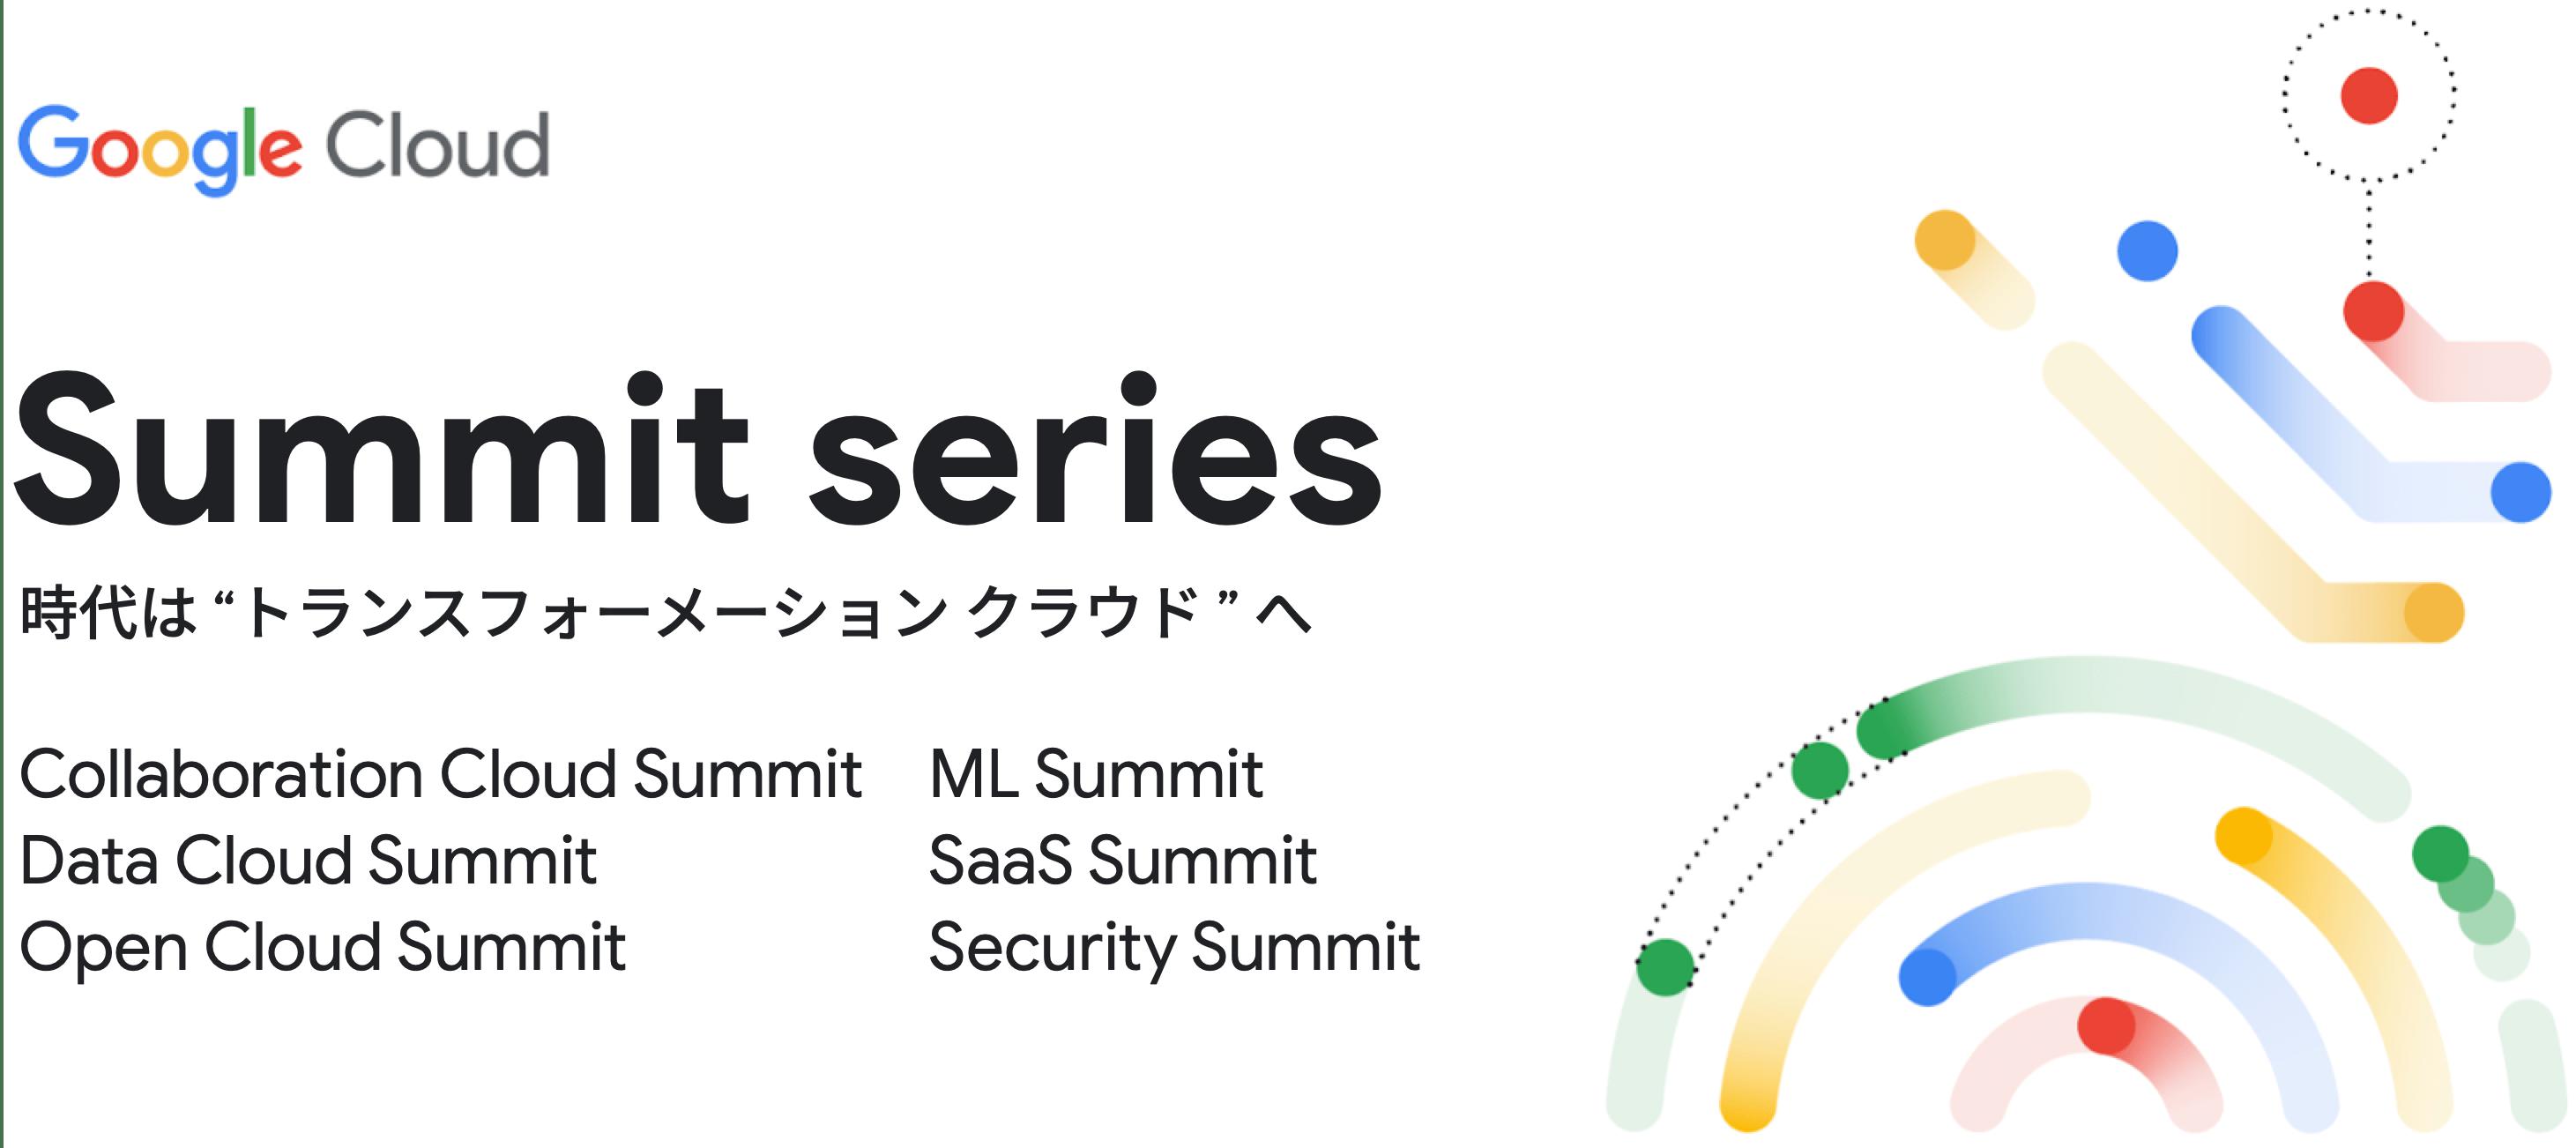 "[GCP] Google Cloud Summit series 〜 時代は ""トランスフォーメーション クラウド "" へ 〜"